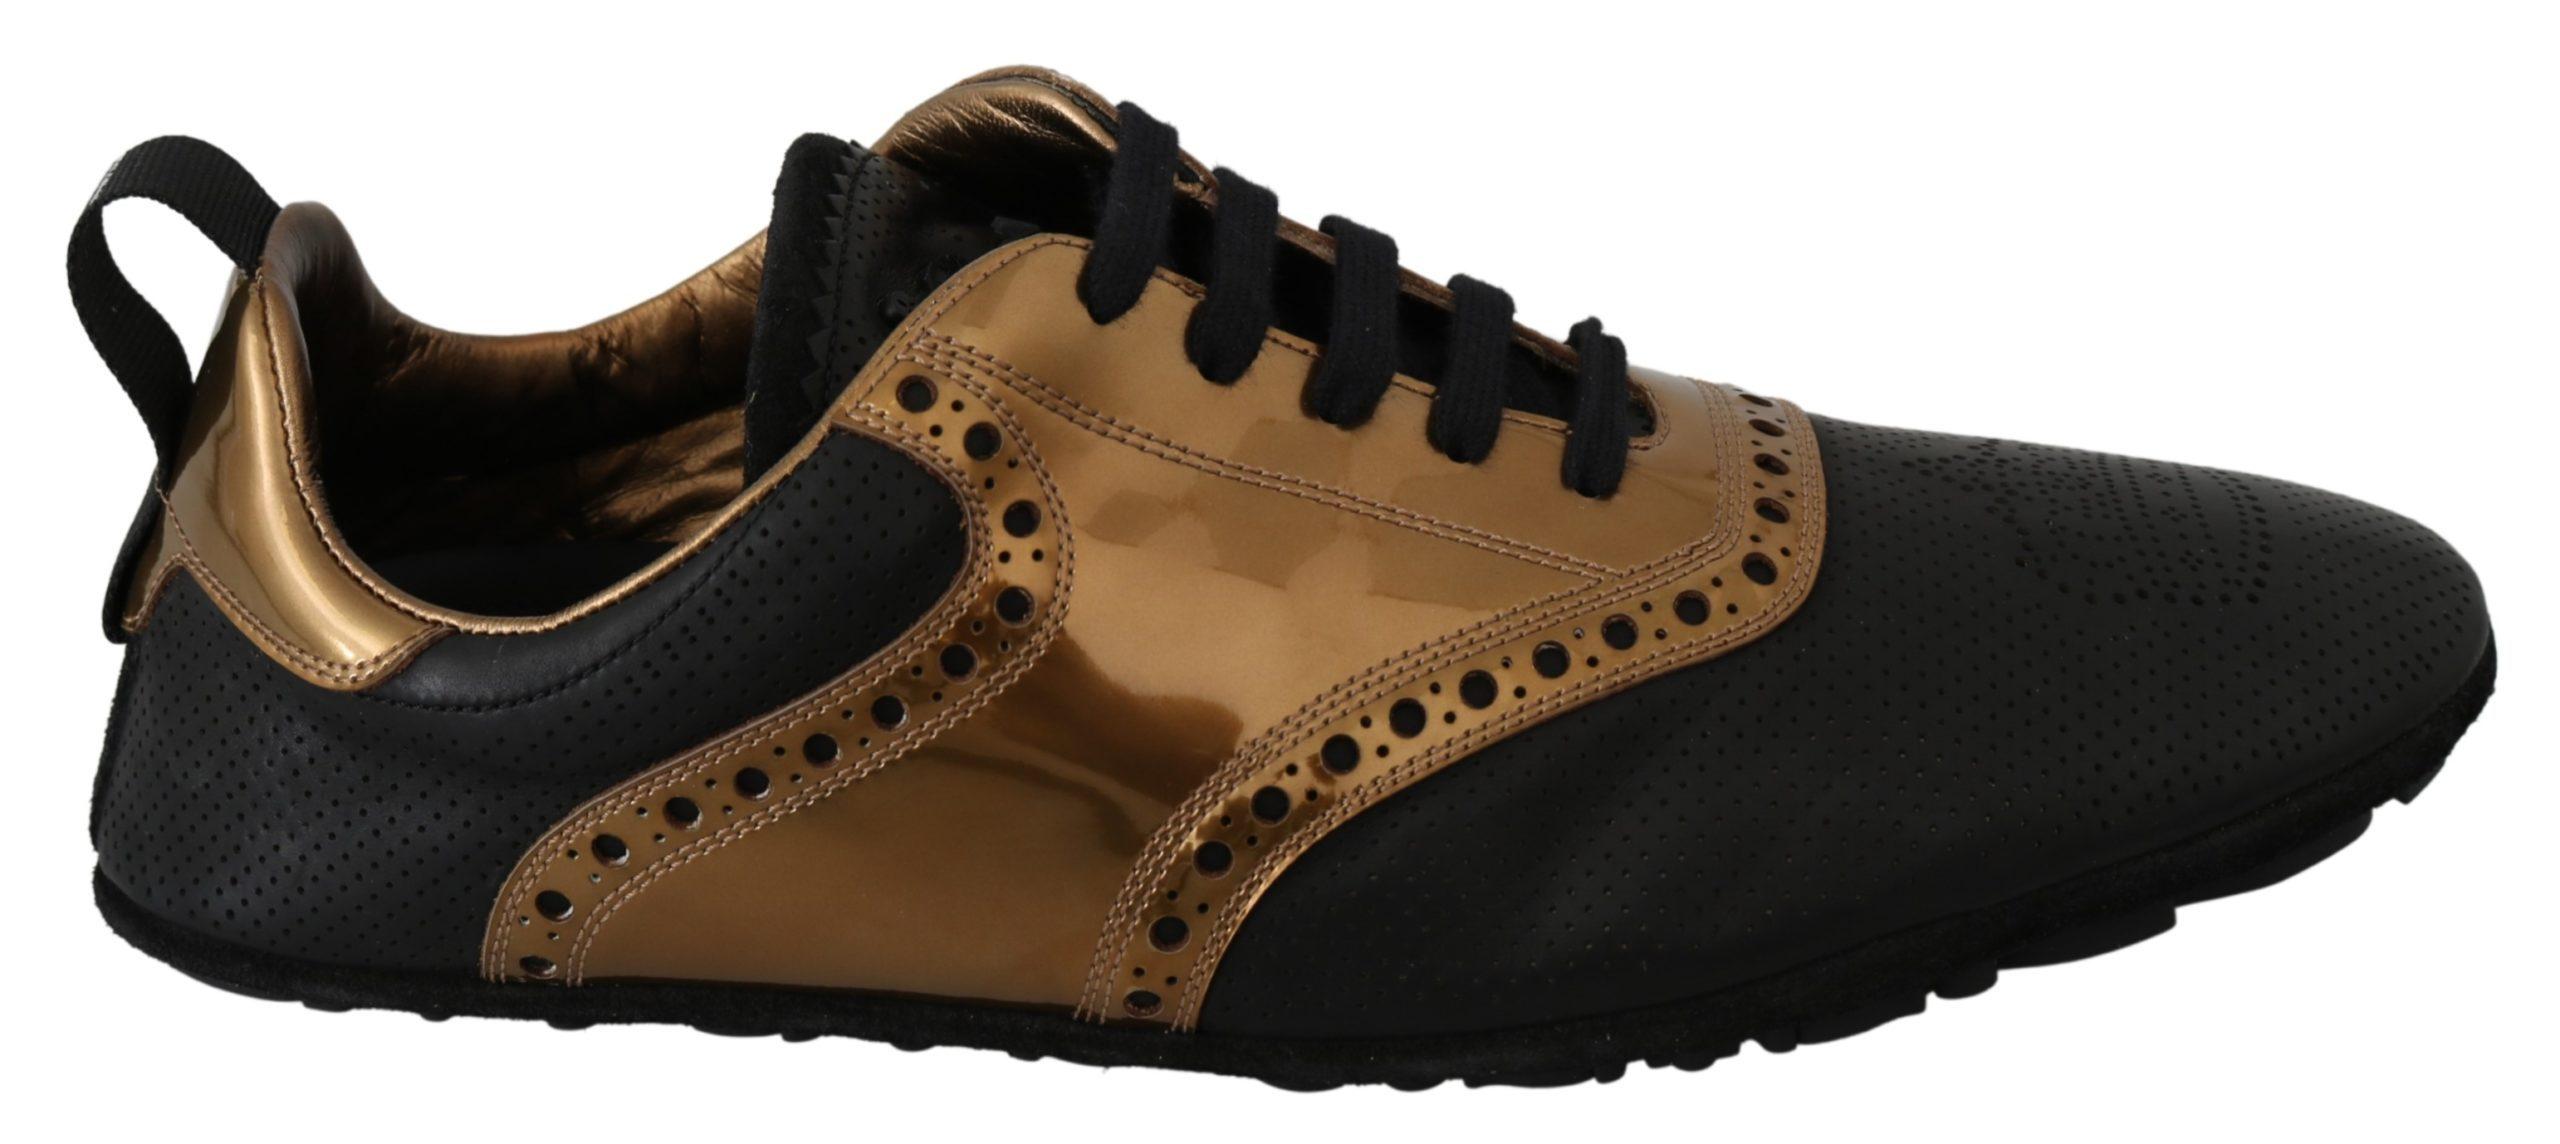 Dolce & Gabbana Men's Shiny Leather Crown Trainer Gold MV3039 - EU44/US11